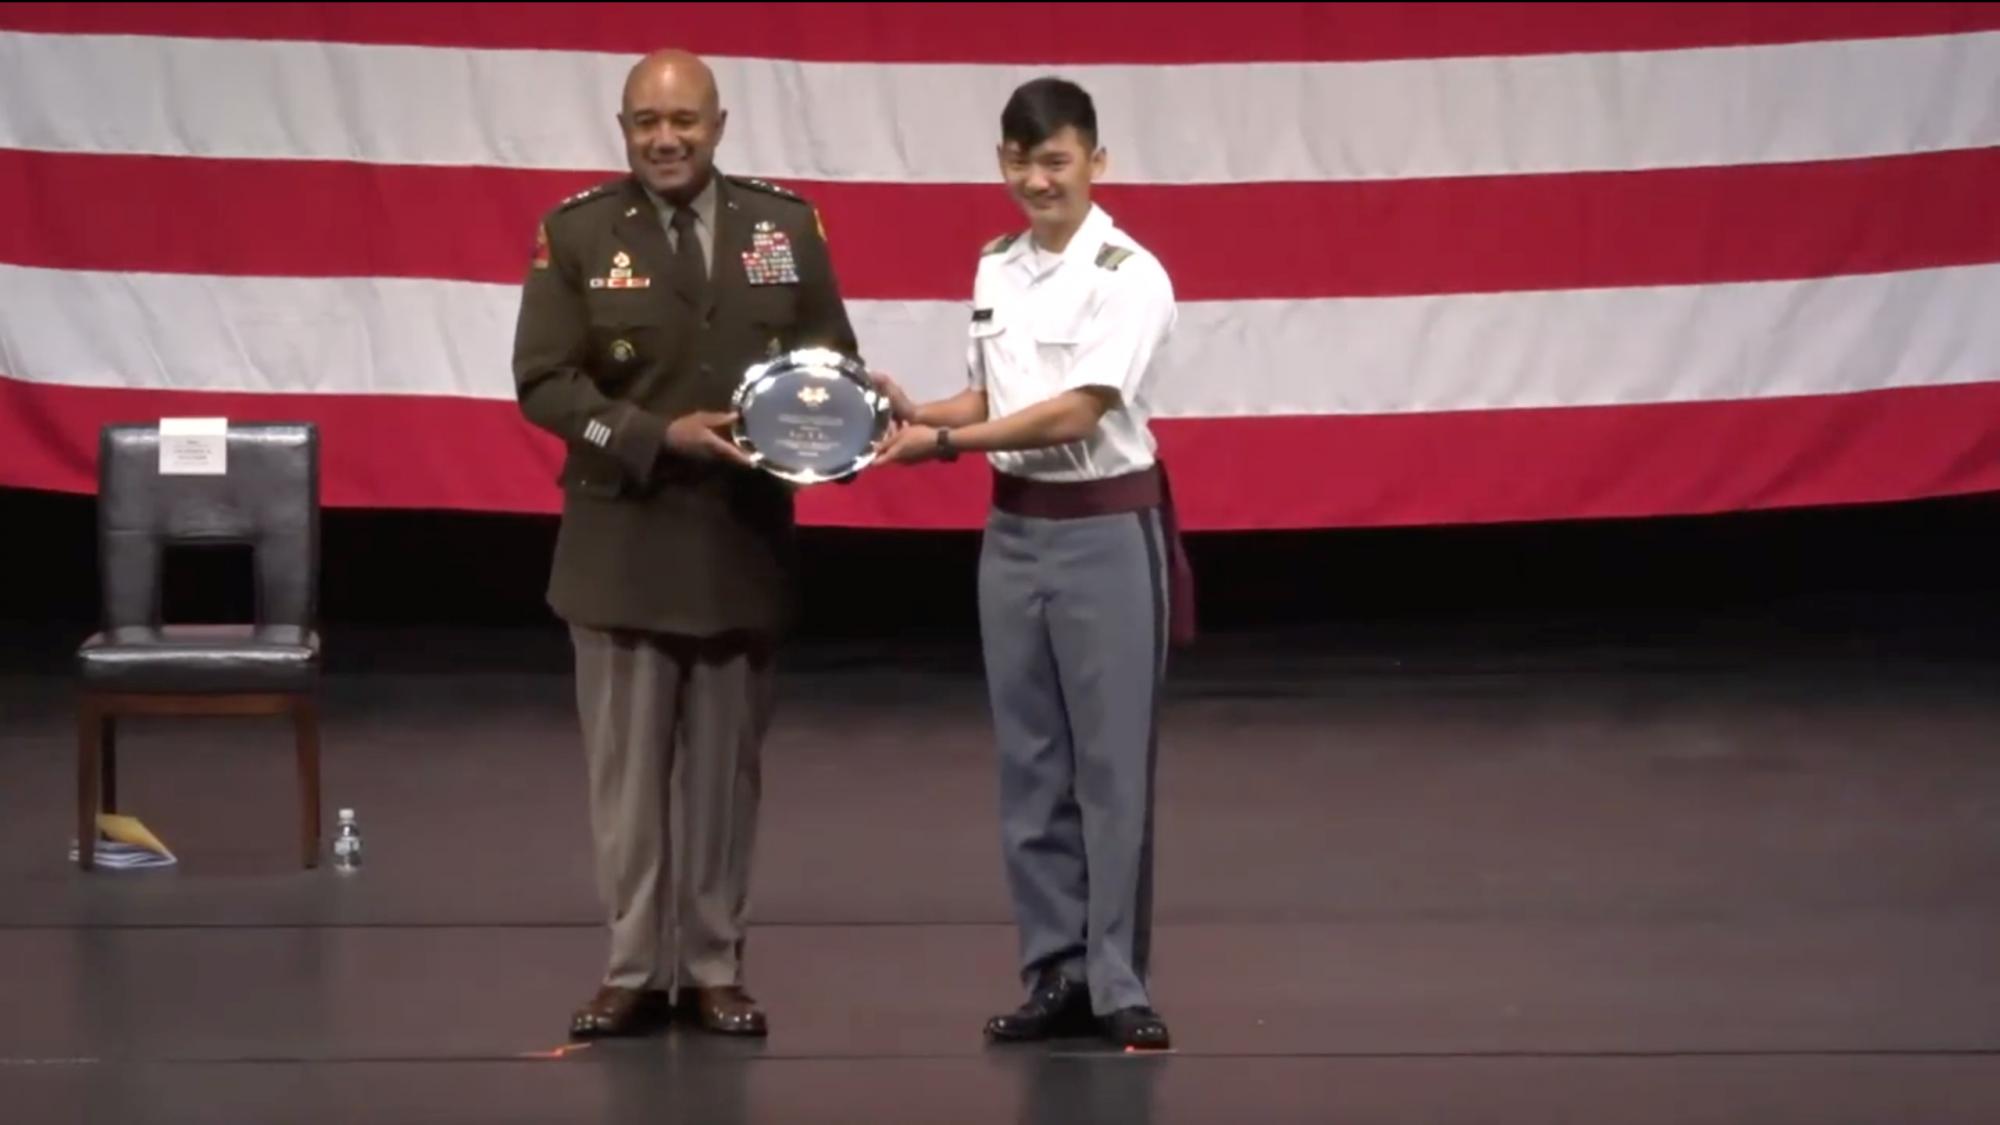 Cadet Brian B. Kim